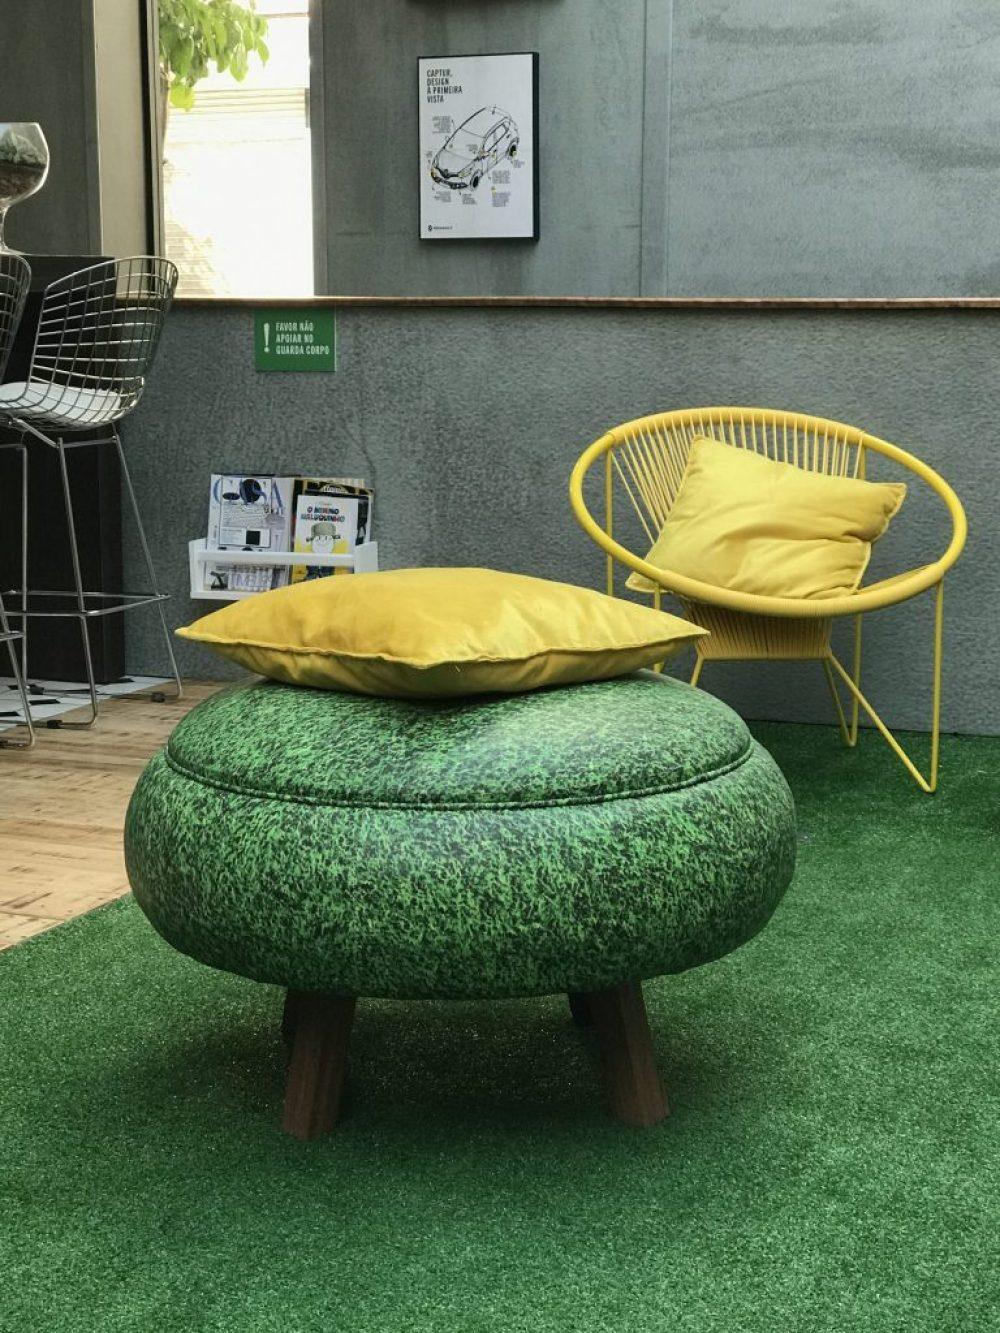 La Mainson Renault. Sala de Estar com grama sintética, pufe com estampa de grama e poltrona amarela.